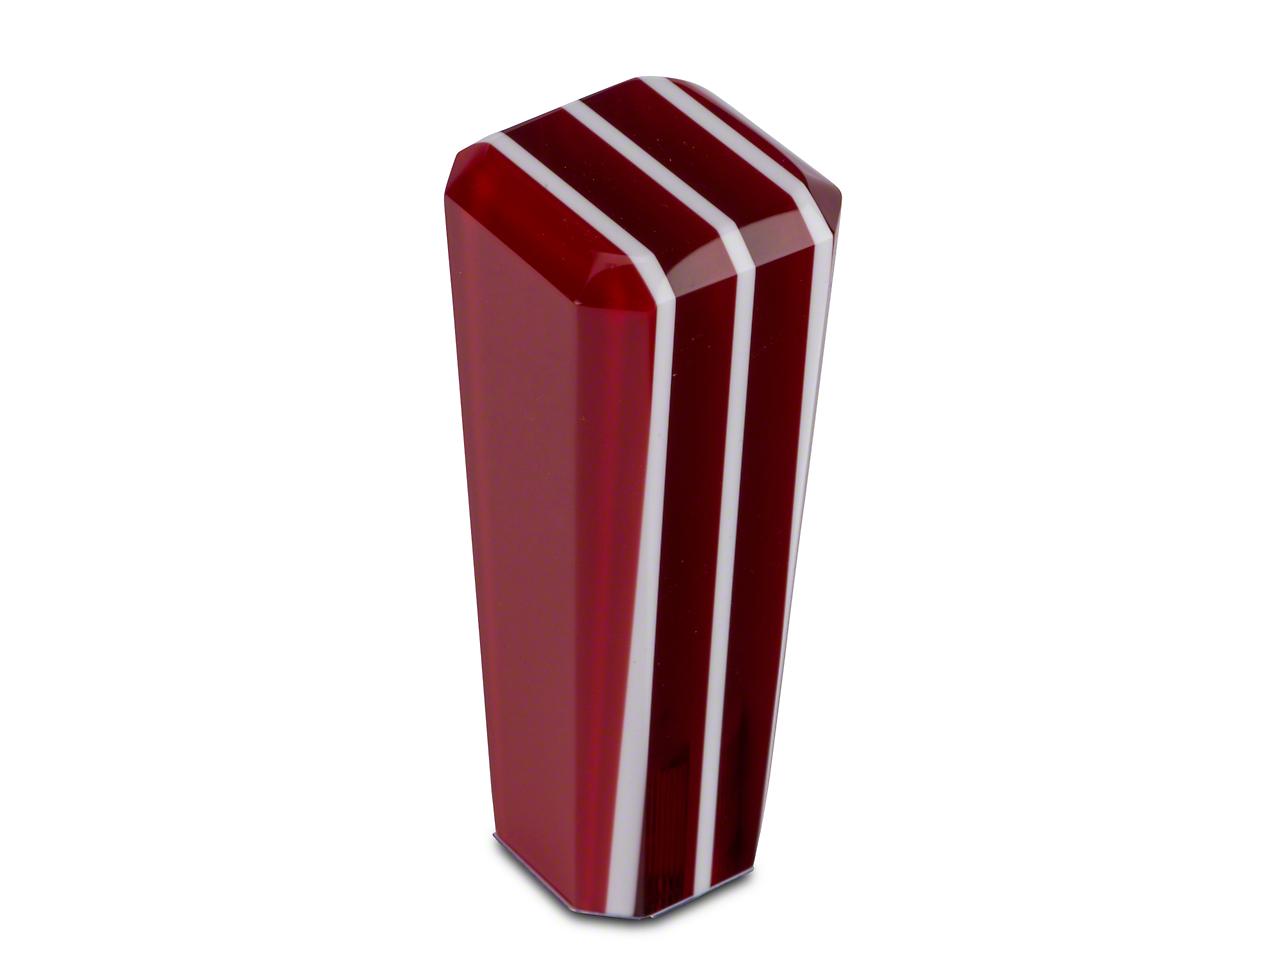 RedRock 4x4 Red Stripe Stix Shift Knob (97-06 Wrangler TJ)